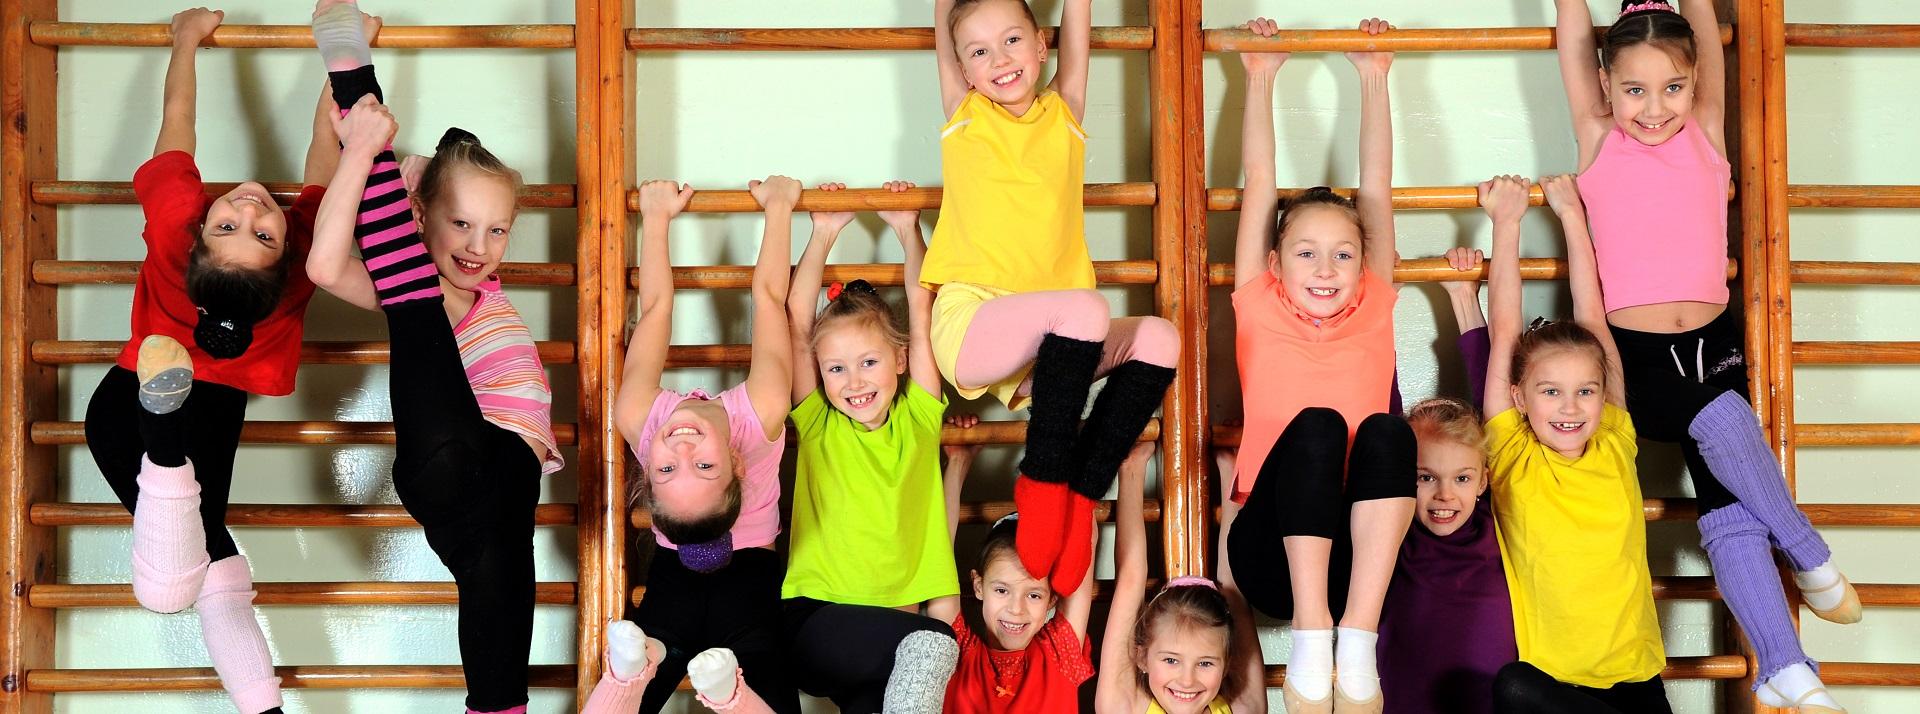 Kinder - Fitness